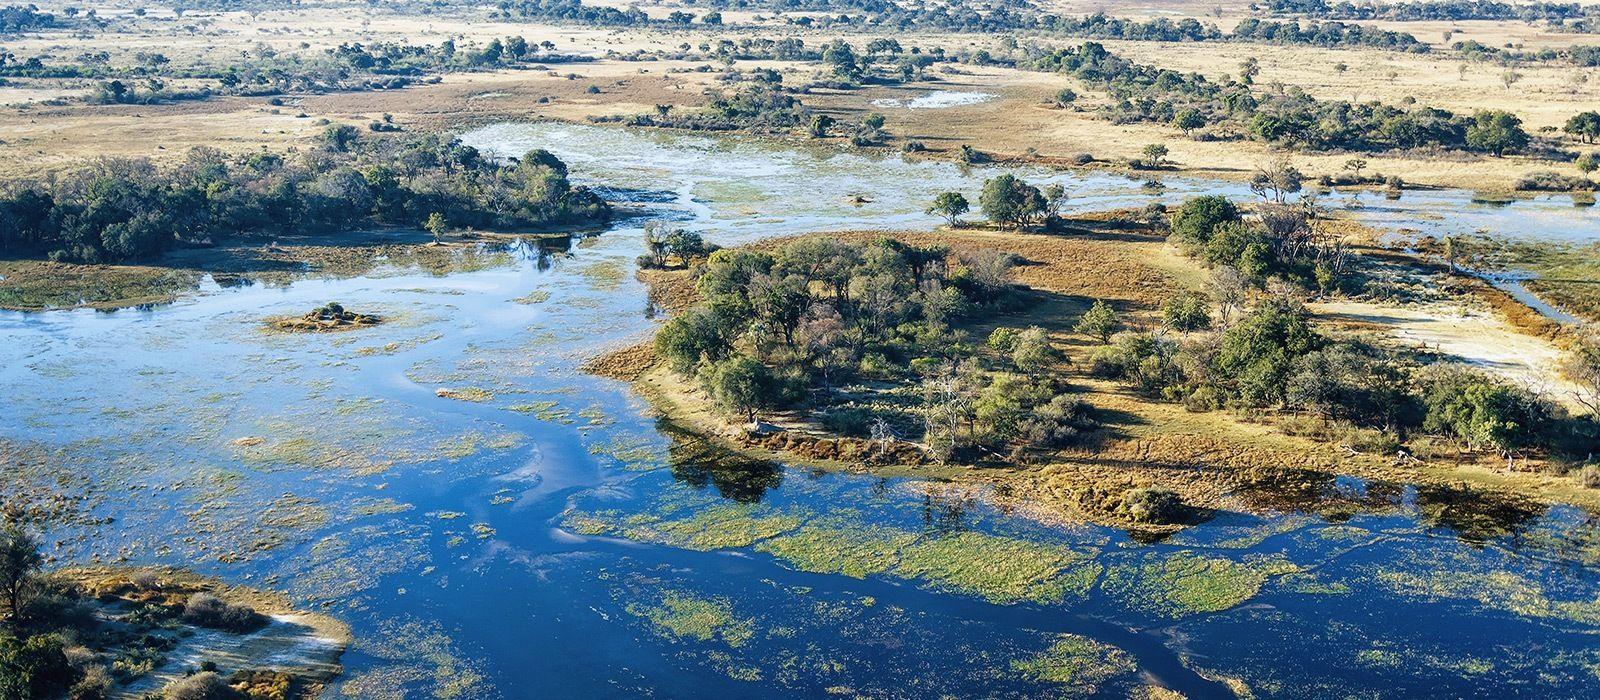 Botswana: Your Wildest Dreams Tour Trip 1